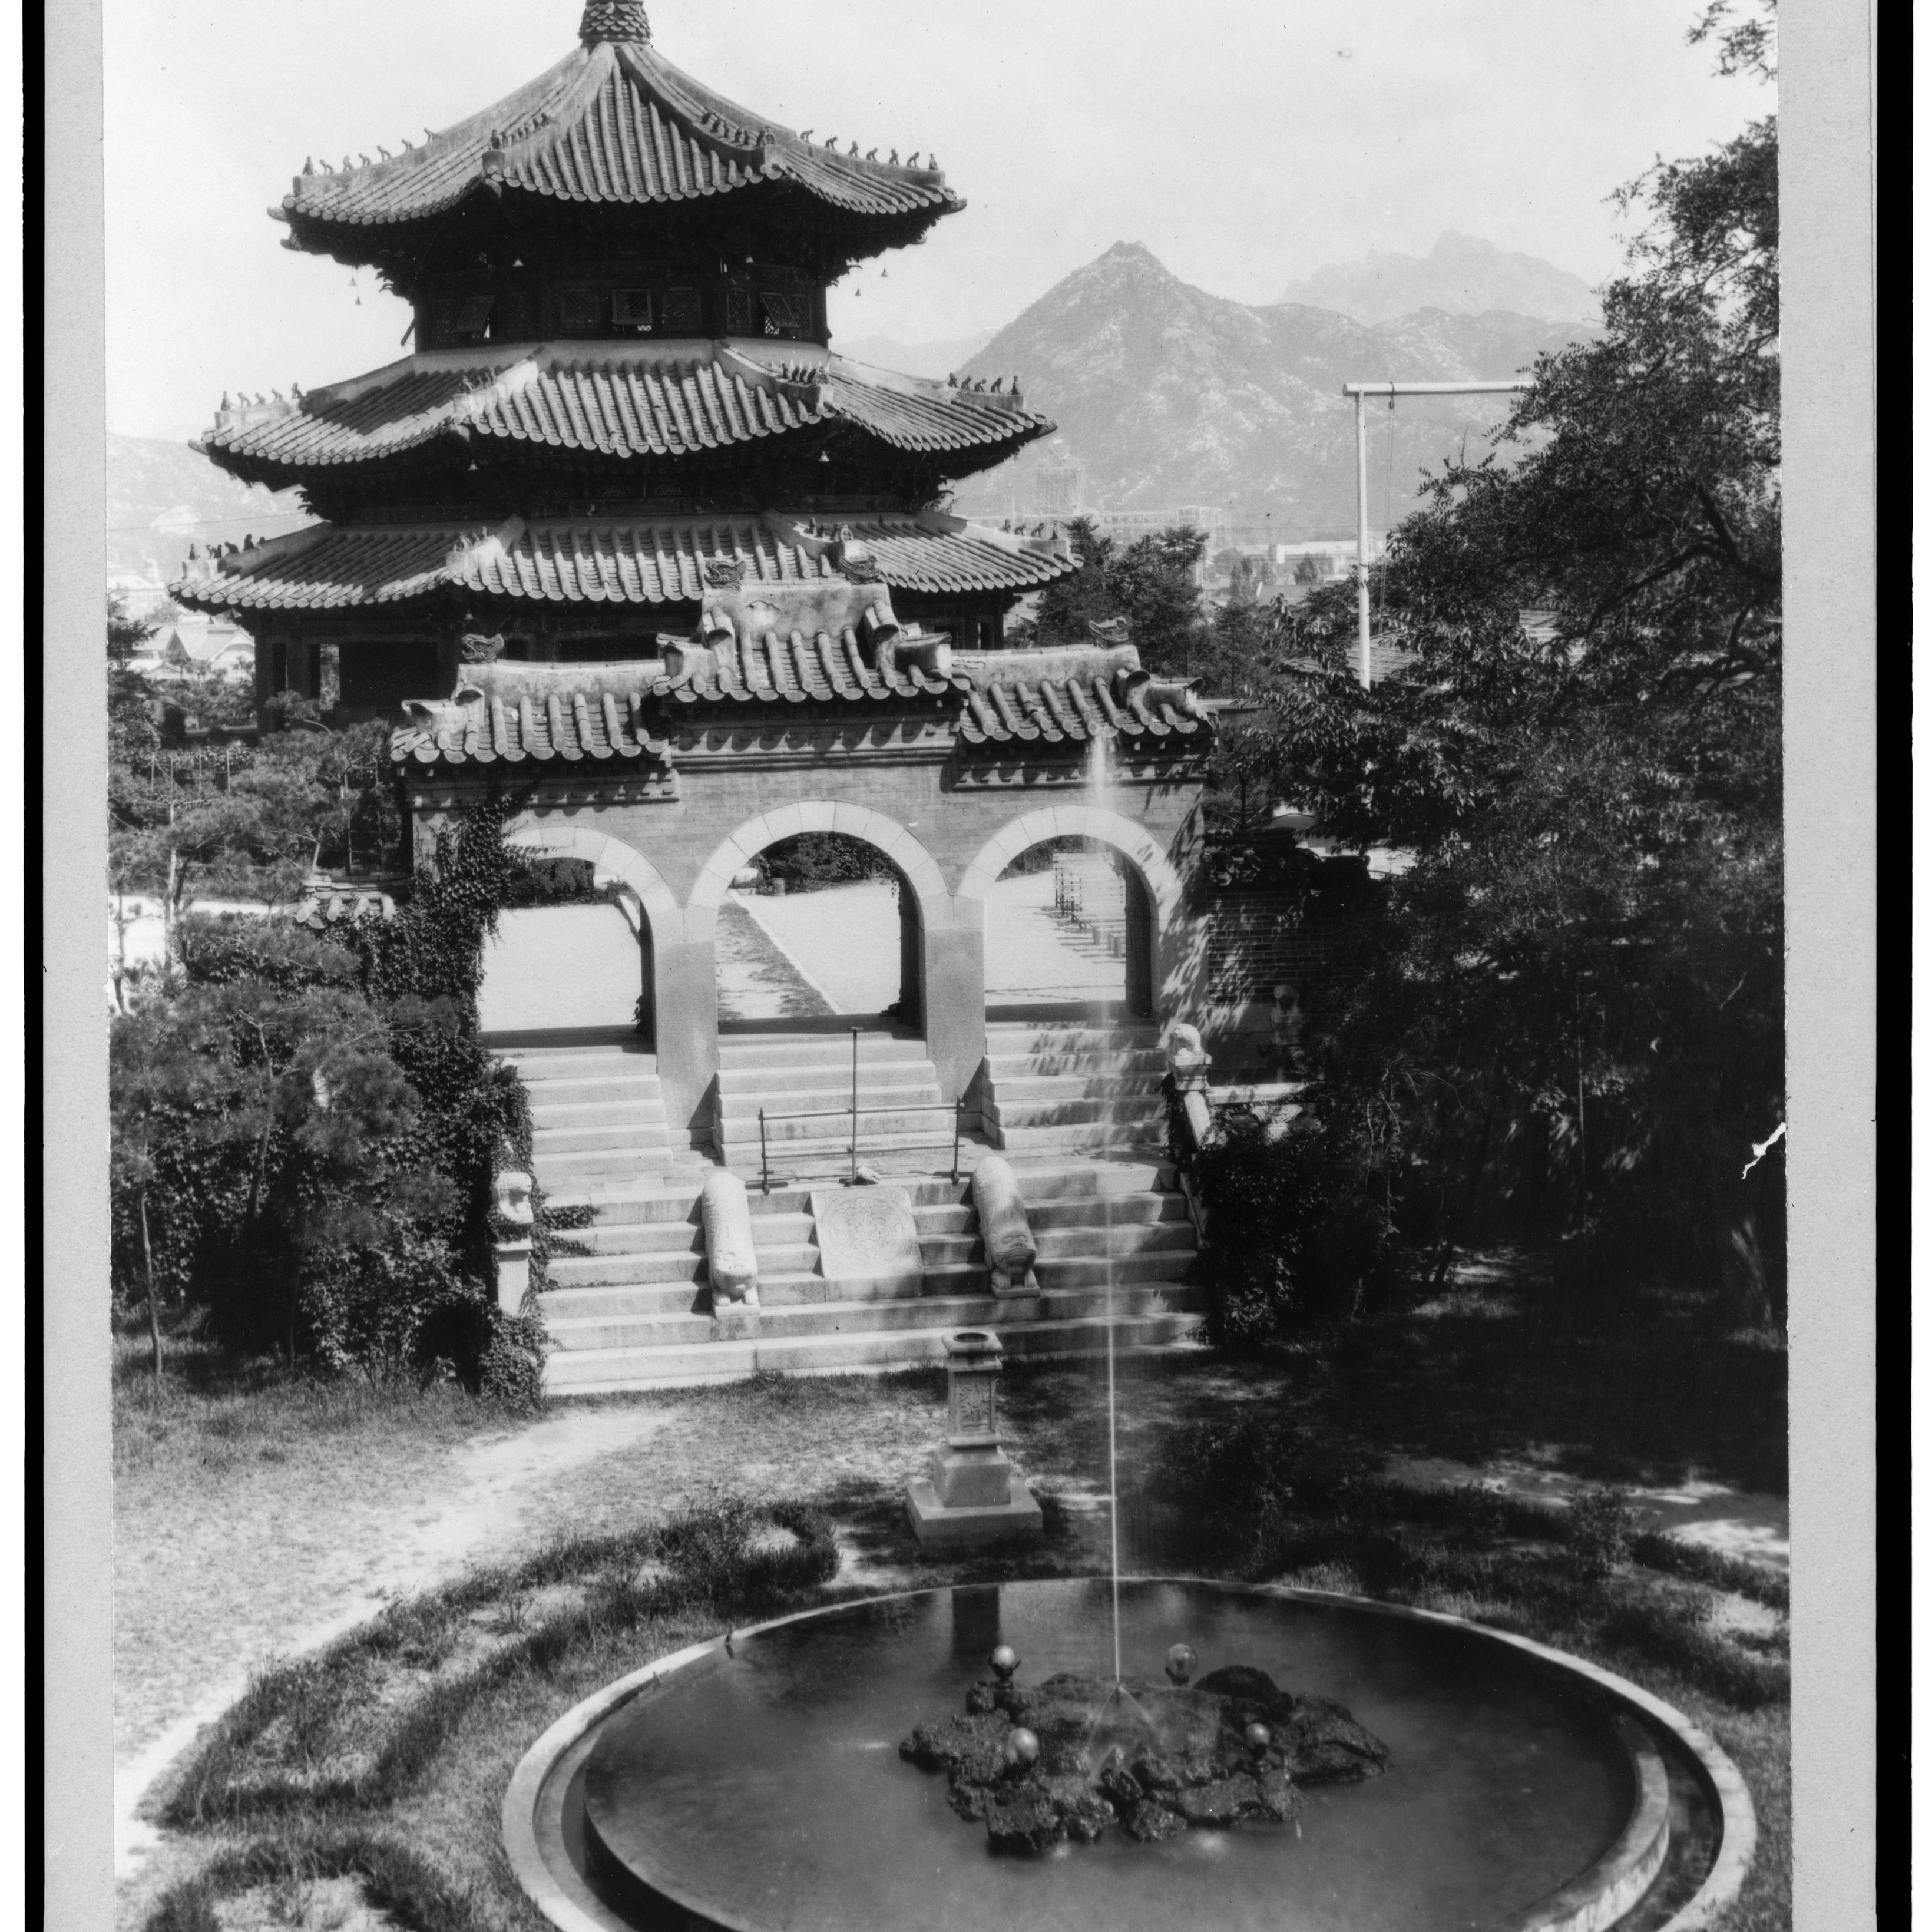 Photo by Frank Carpenter, 1925.